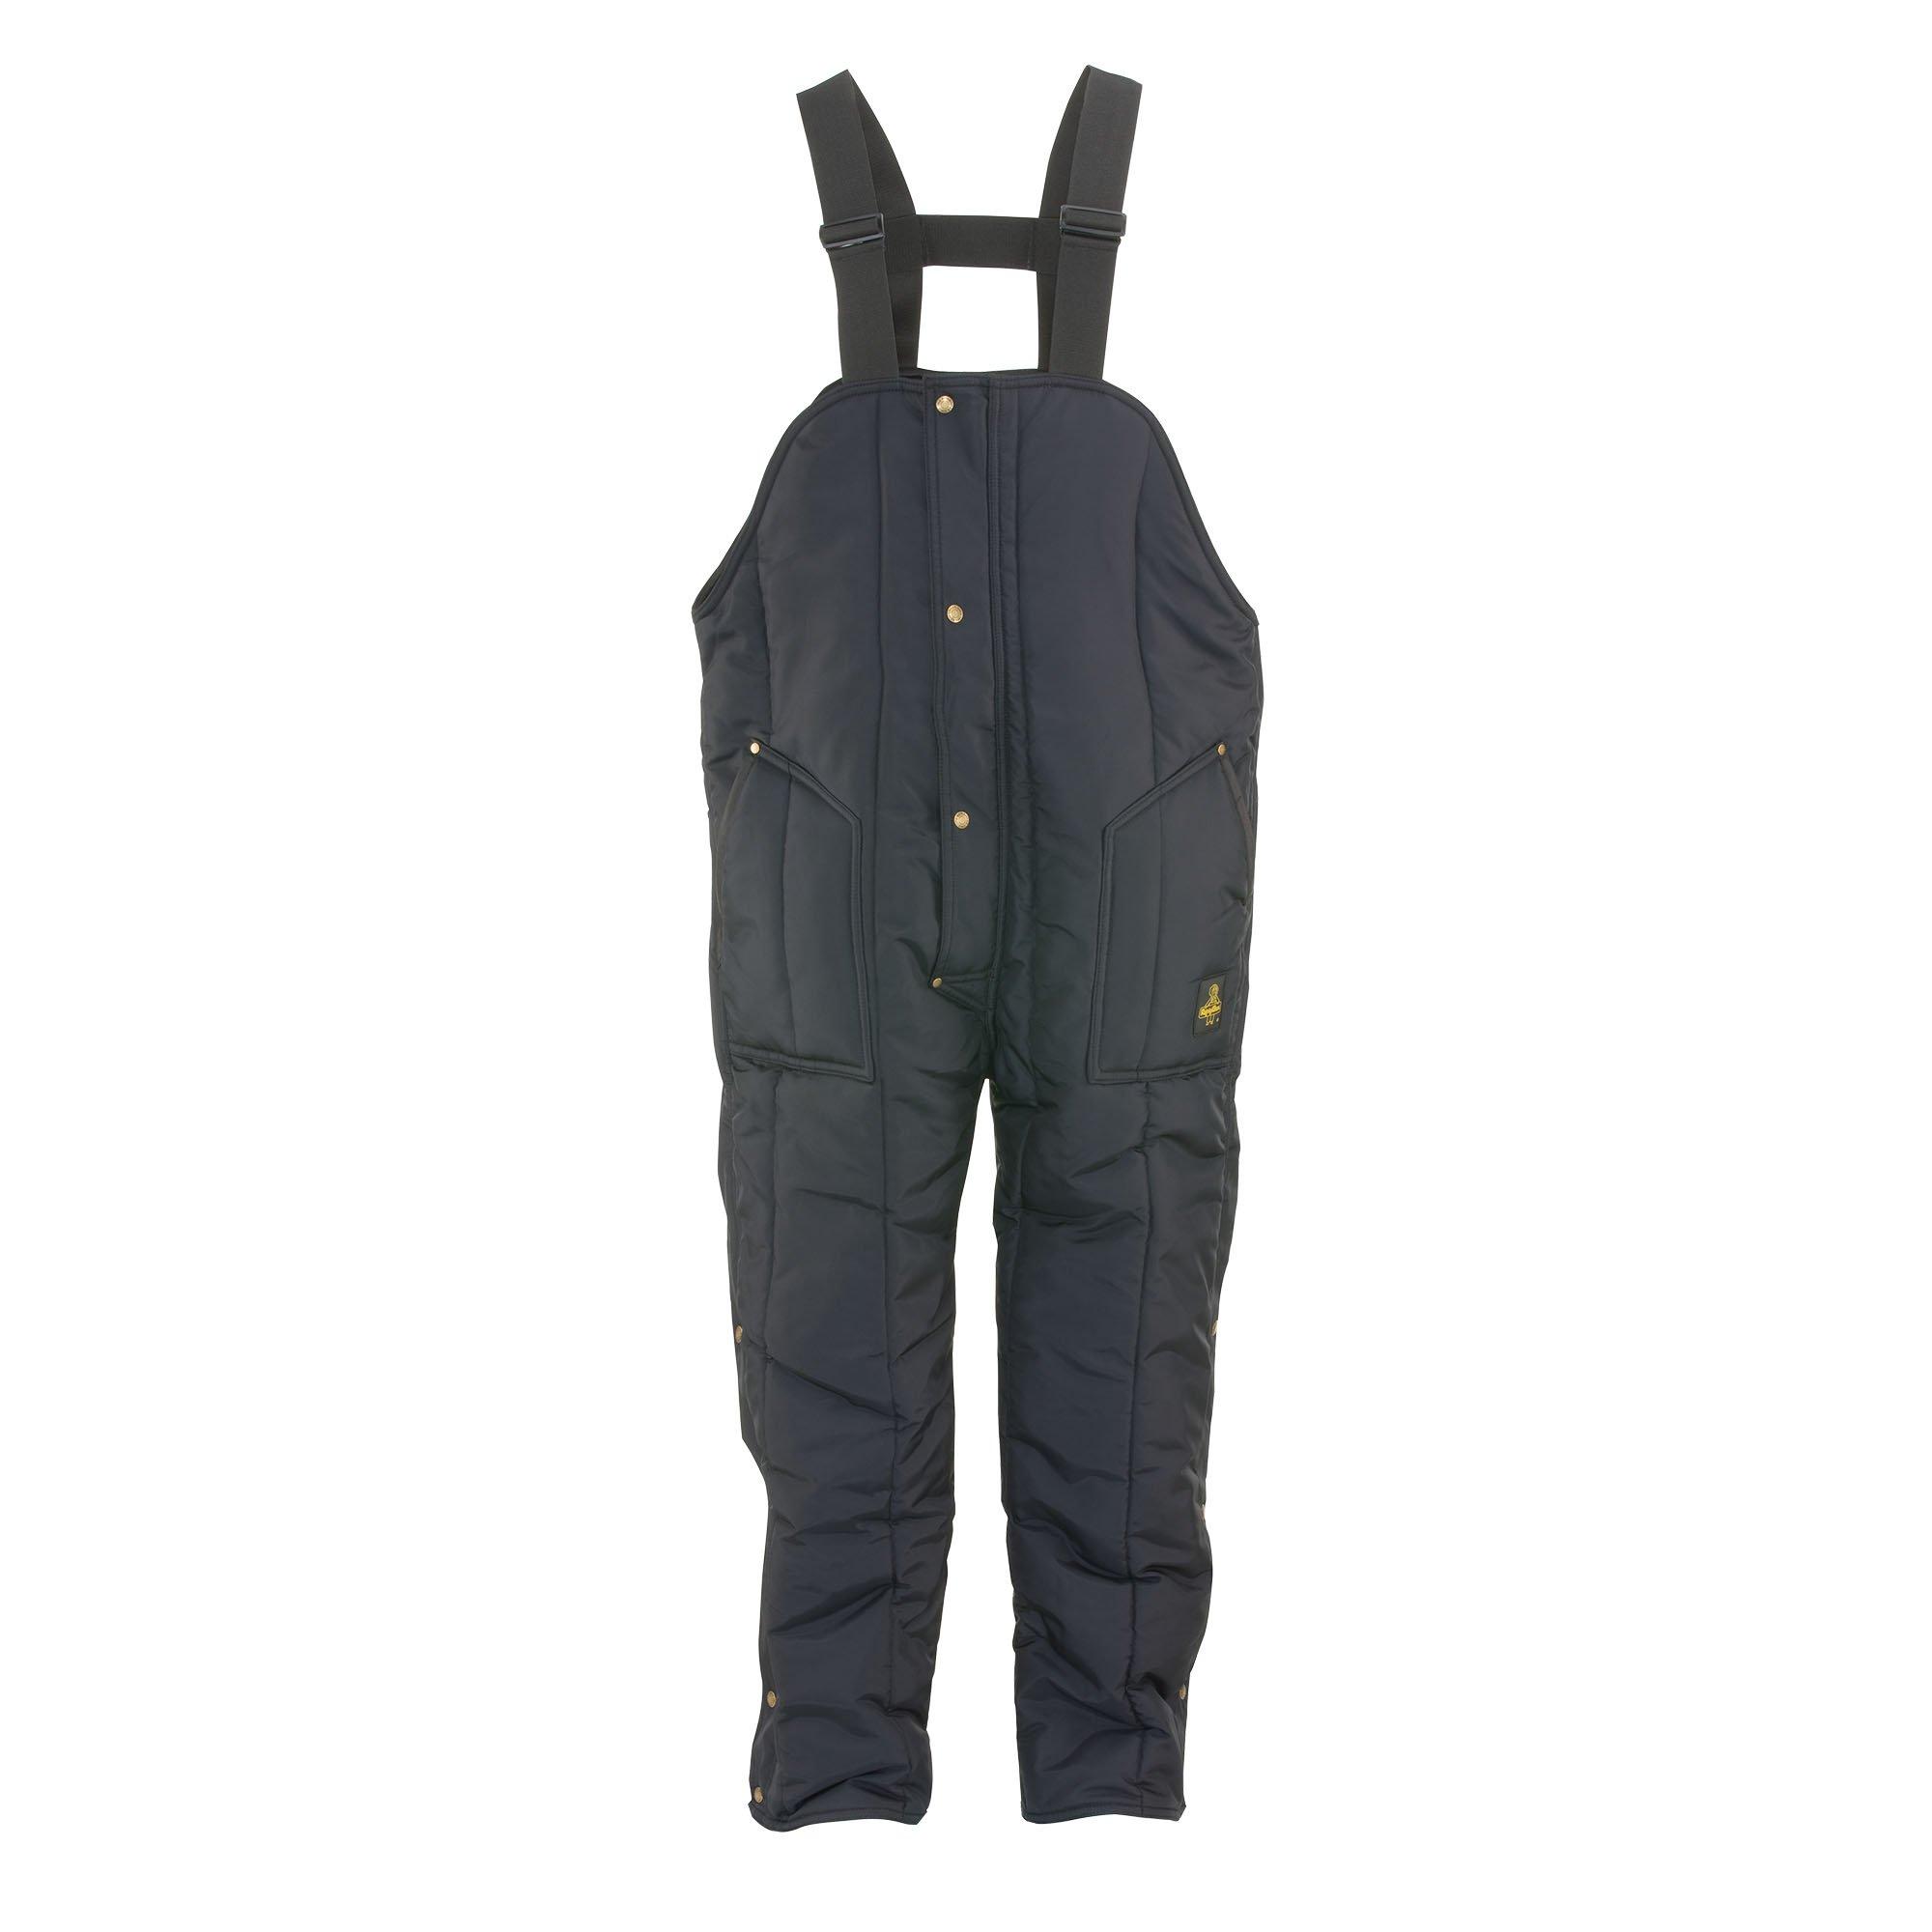 RefrigiWear Men's Iron-Tuff Insulated High Bib Overalls (Navy Blue, 2XL Short)